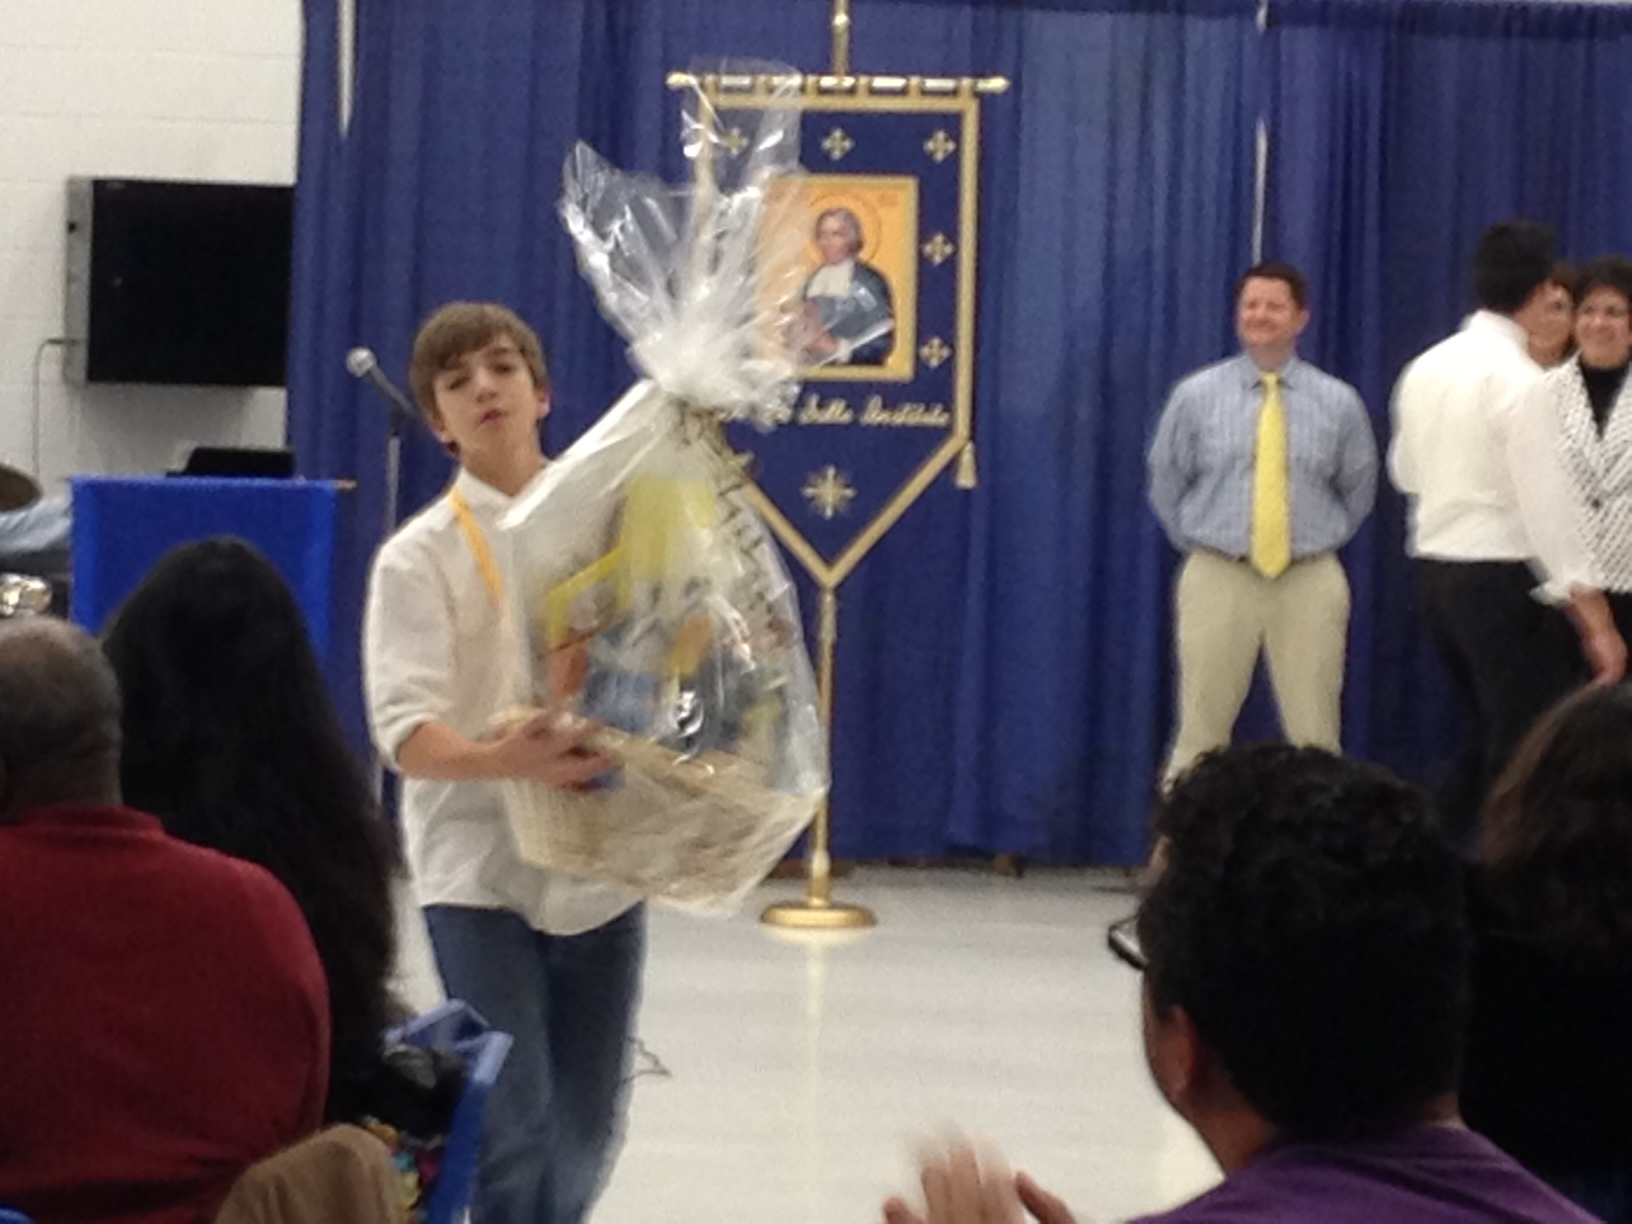 Gavin McAllister receiving his award